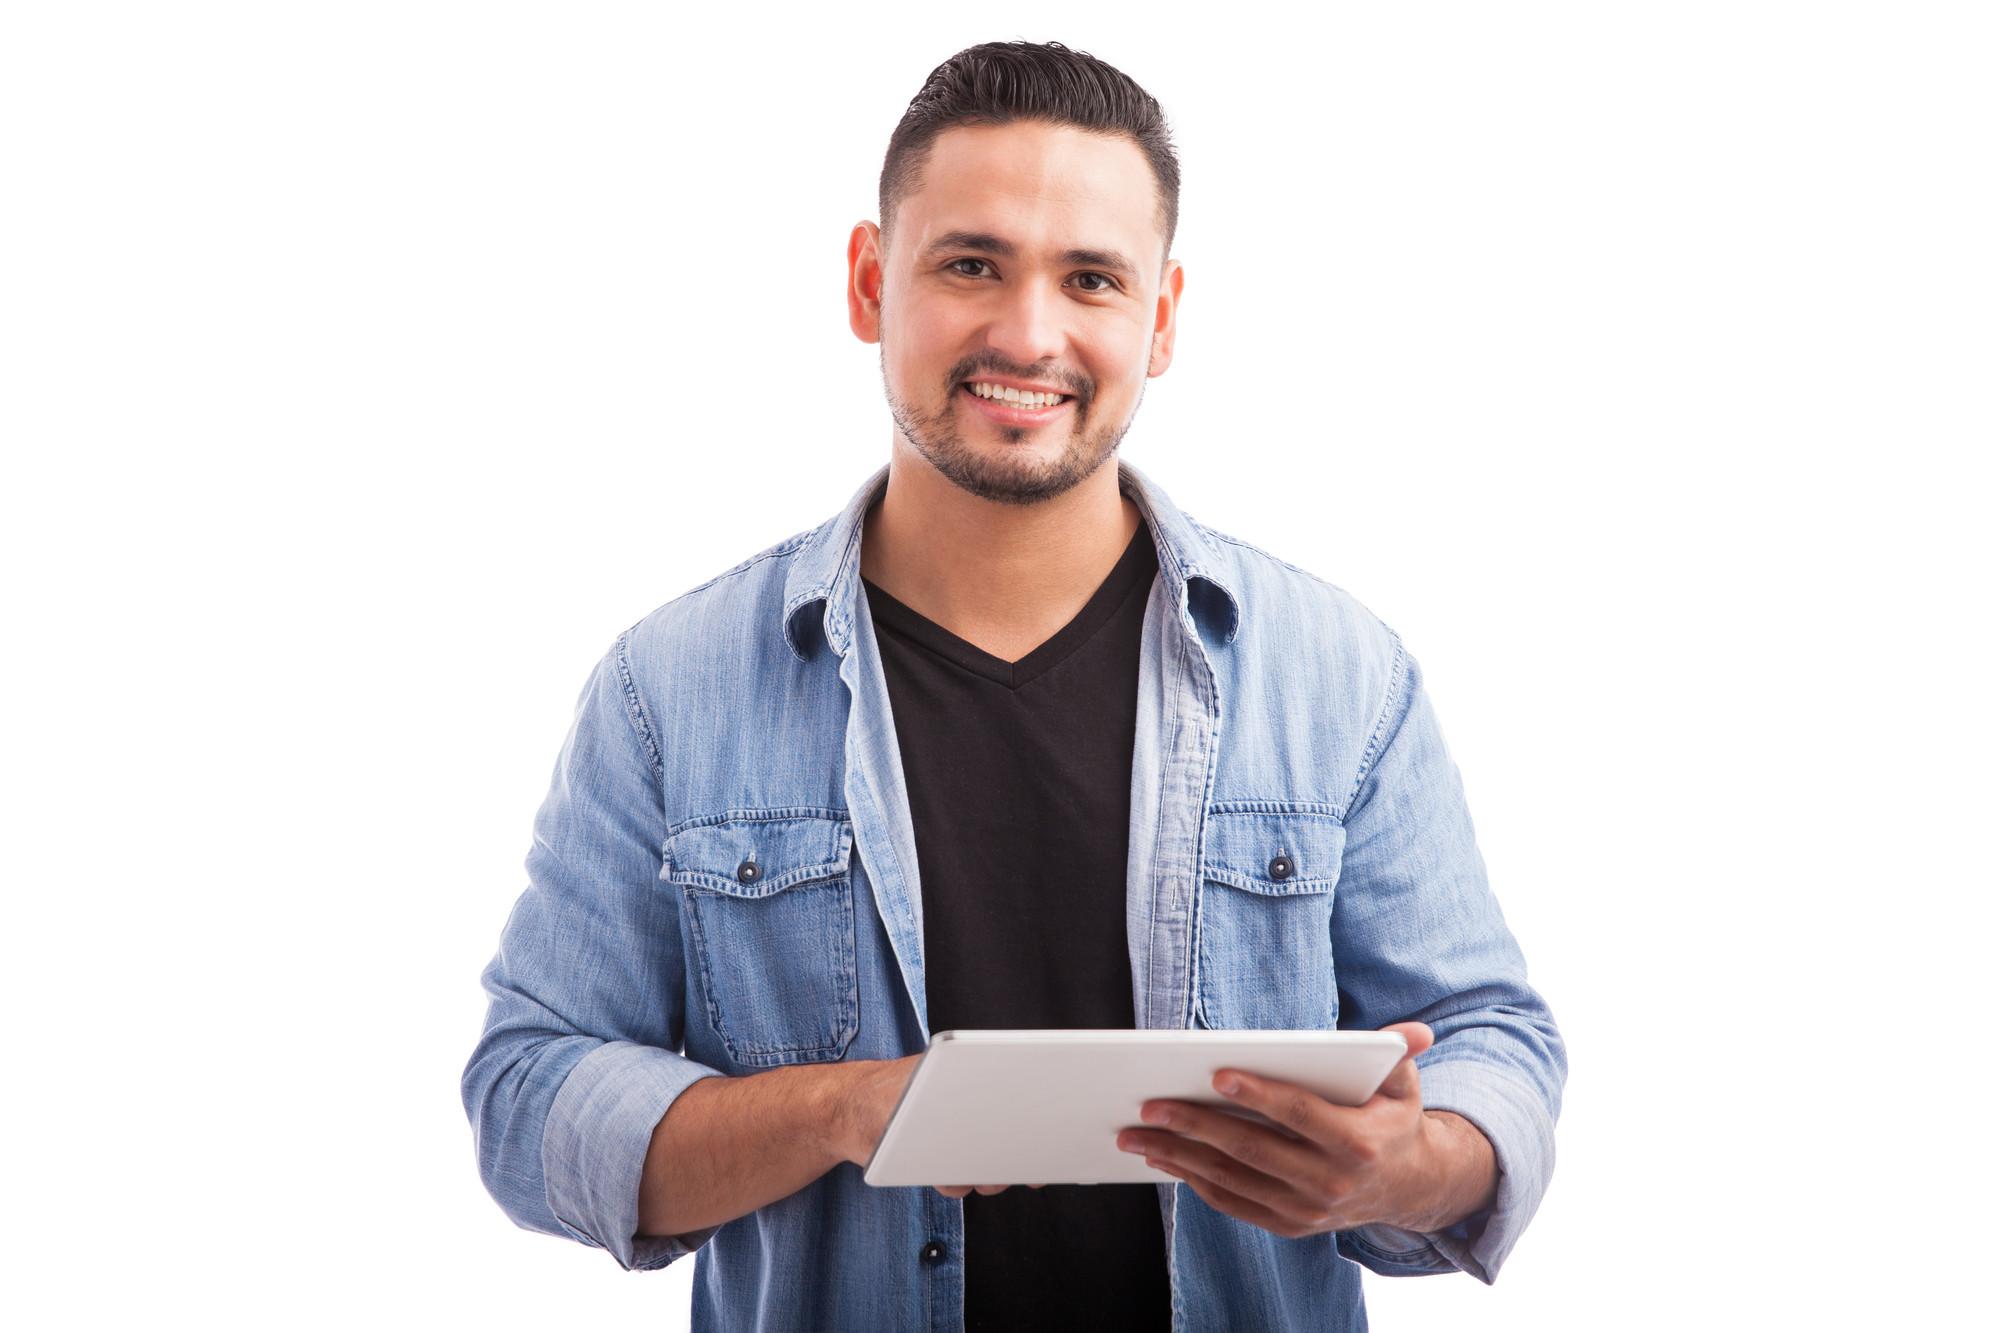 Homme consultant une tablette